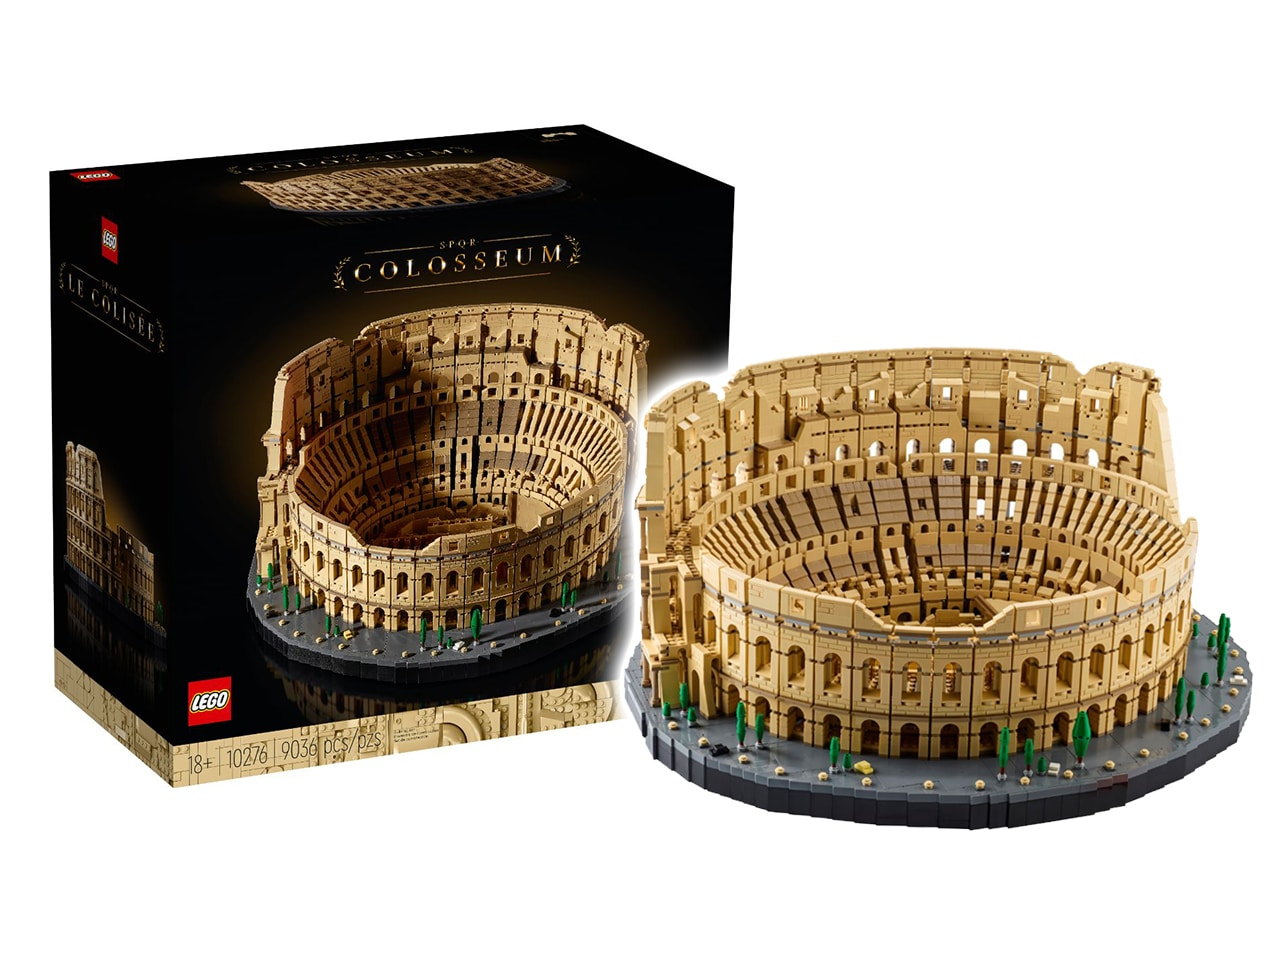 LEGO 10276 Colosseum offiziell vorgestellt